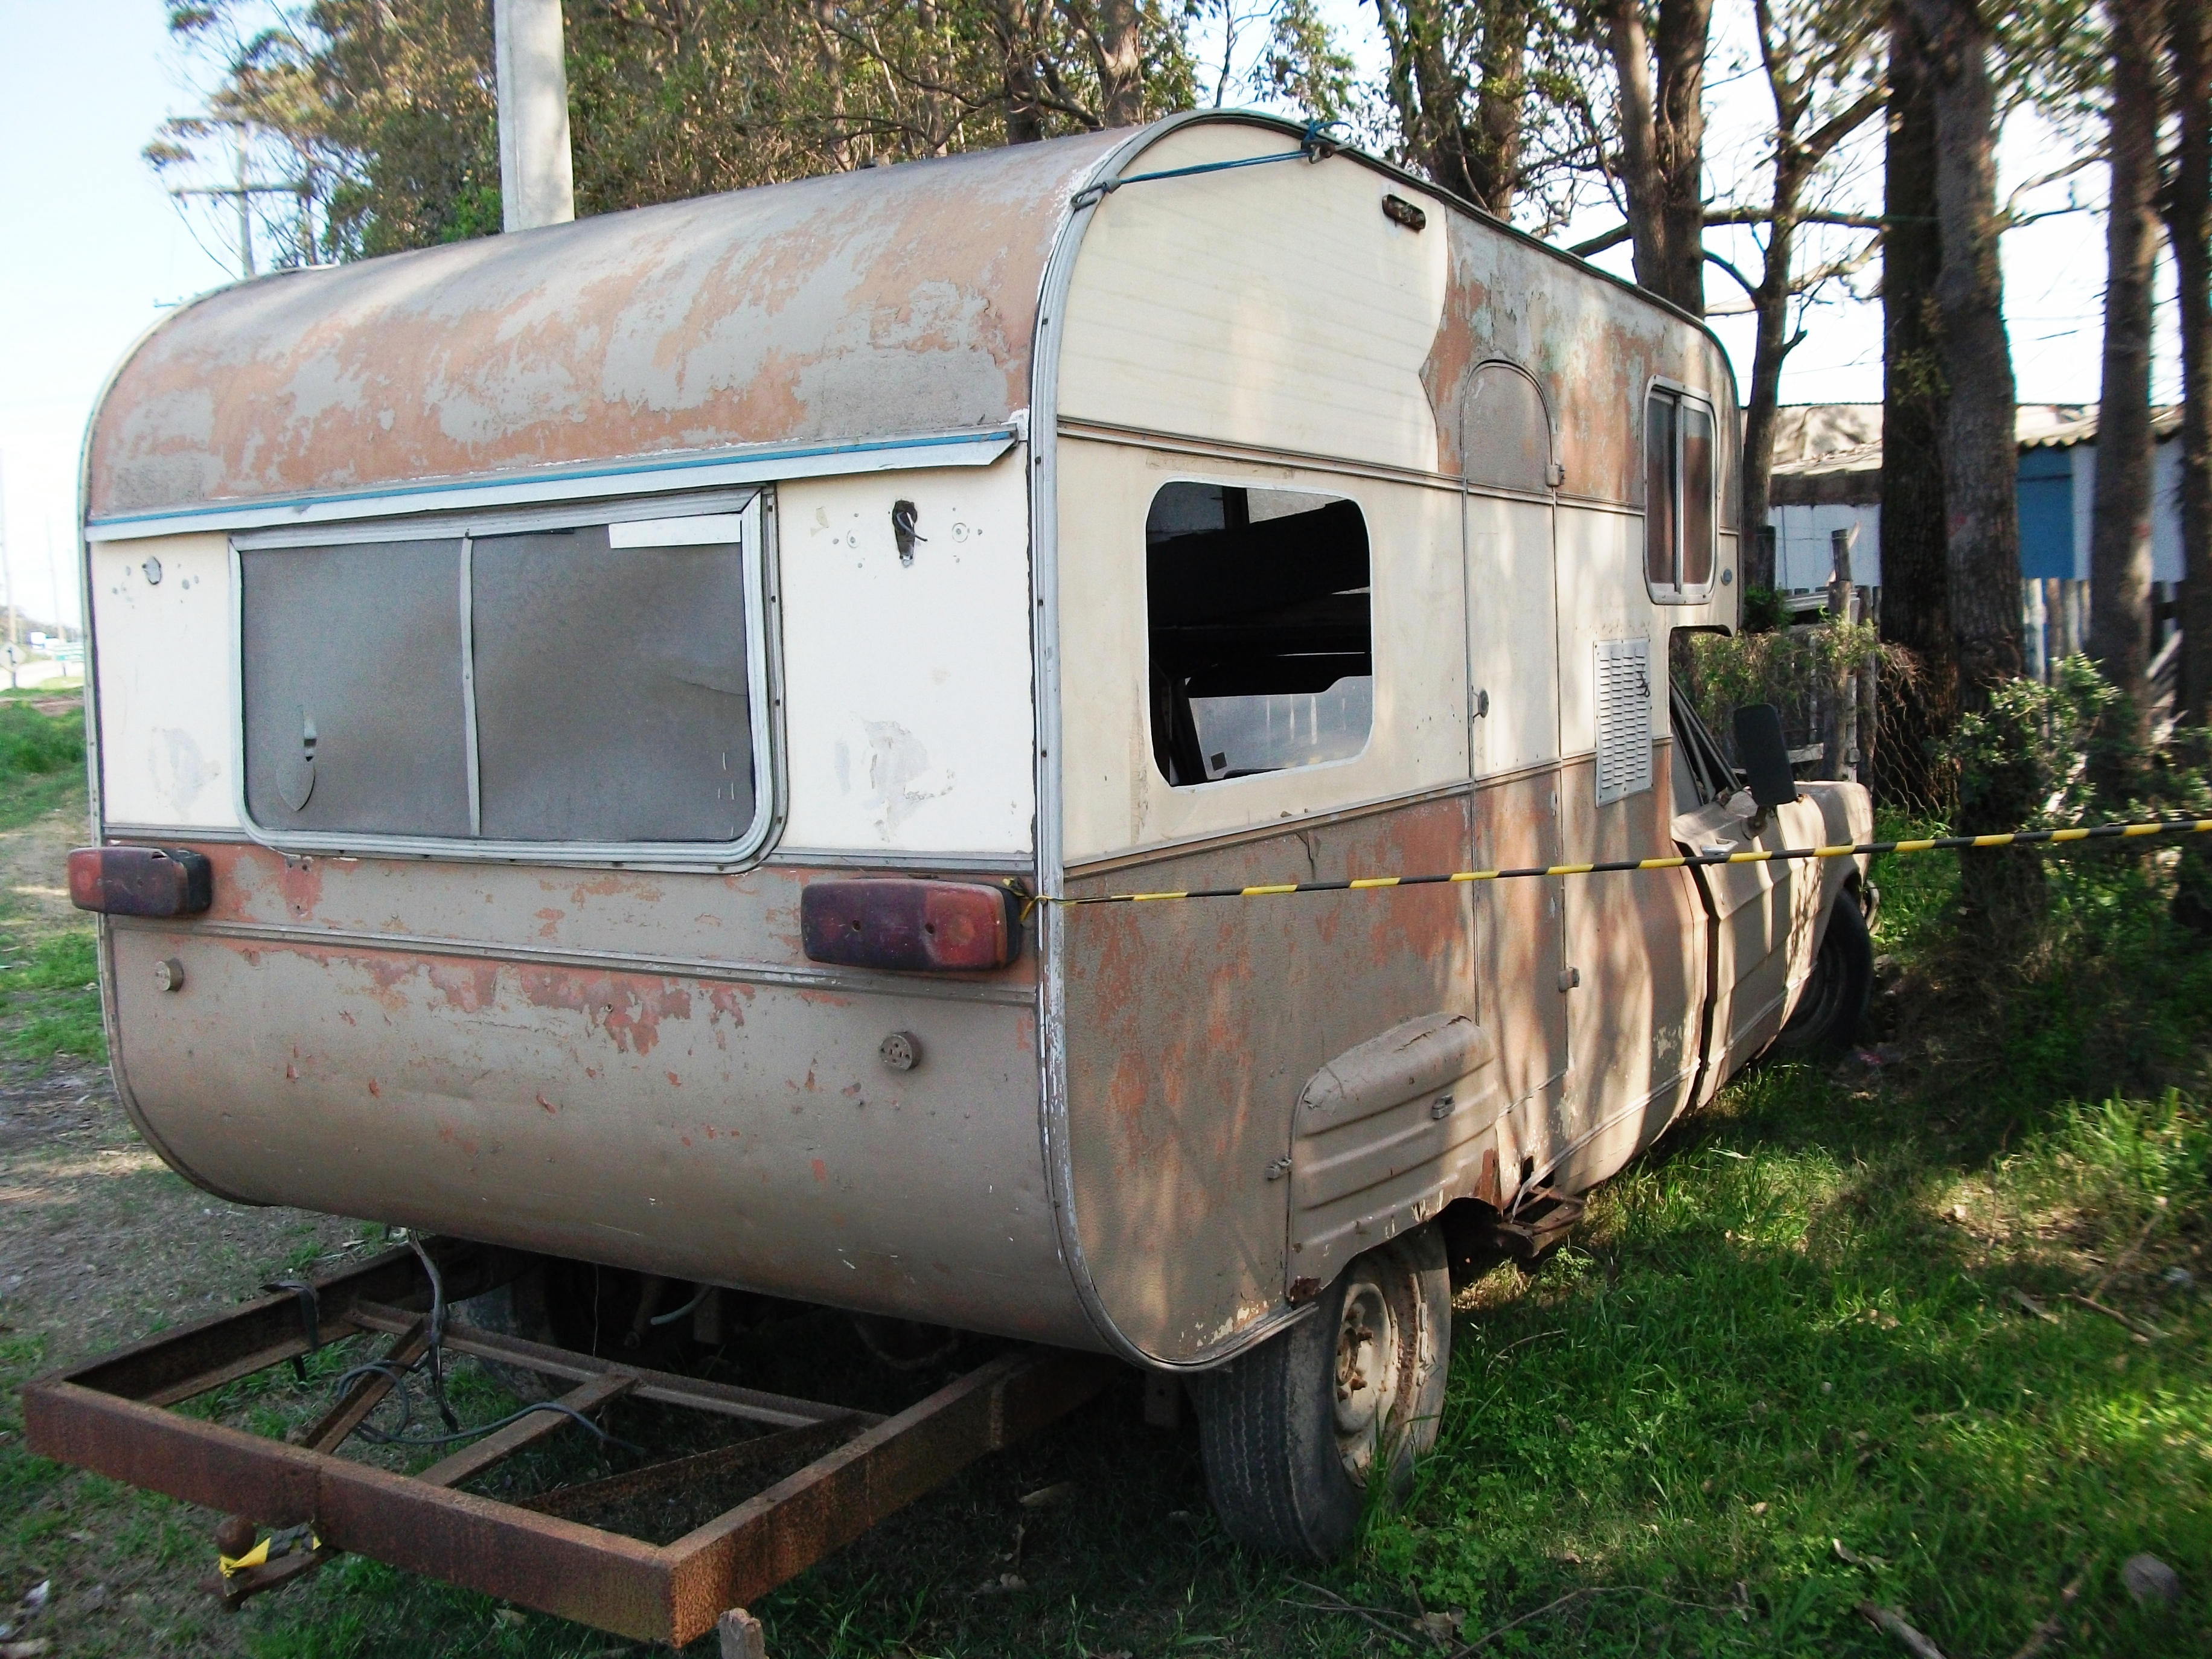 landau_trailer_5_sibele Ford Galaxie